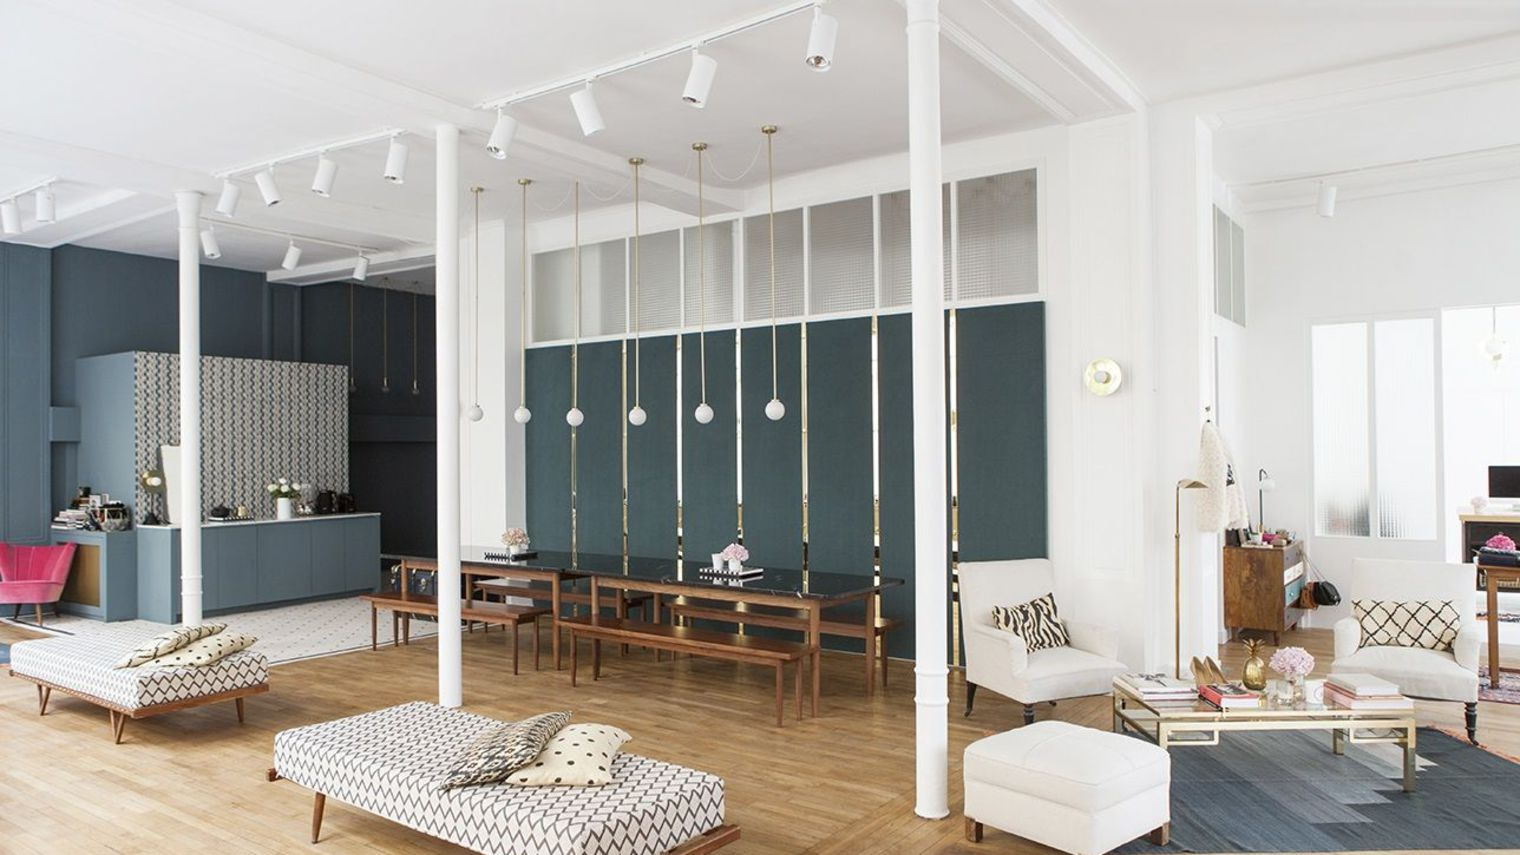 acheter un appartement un investissement int ressant. Black Bedroom Furniture Sets. Home Design Ideas